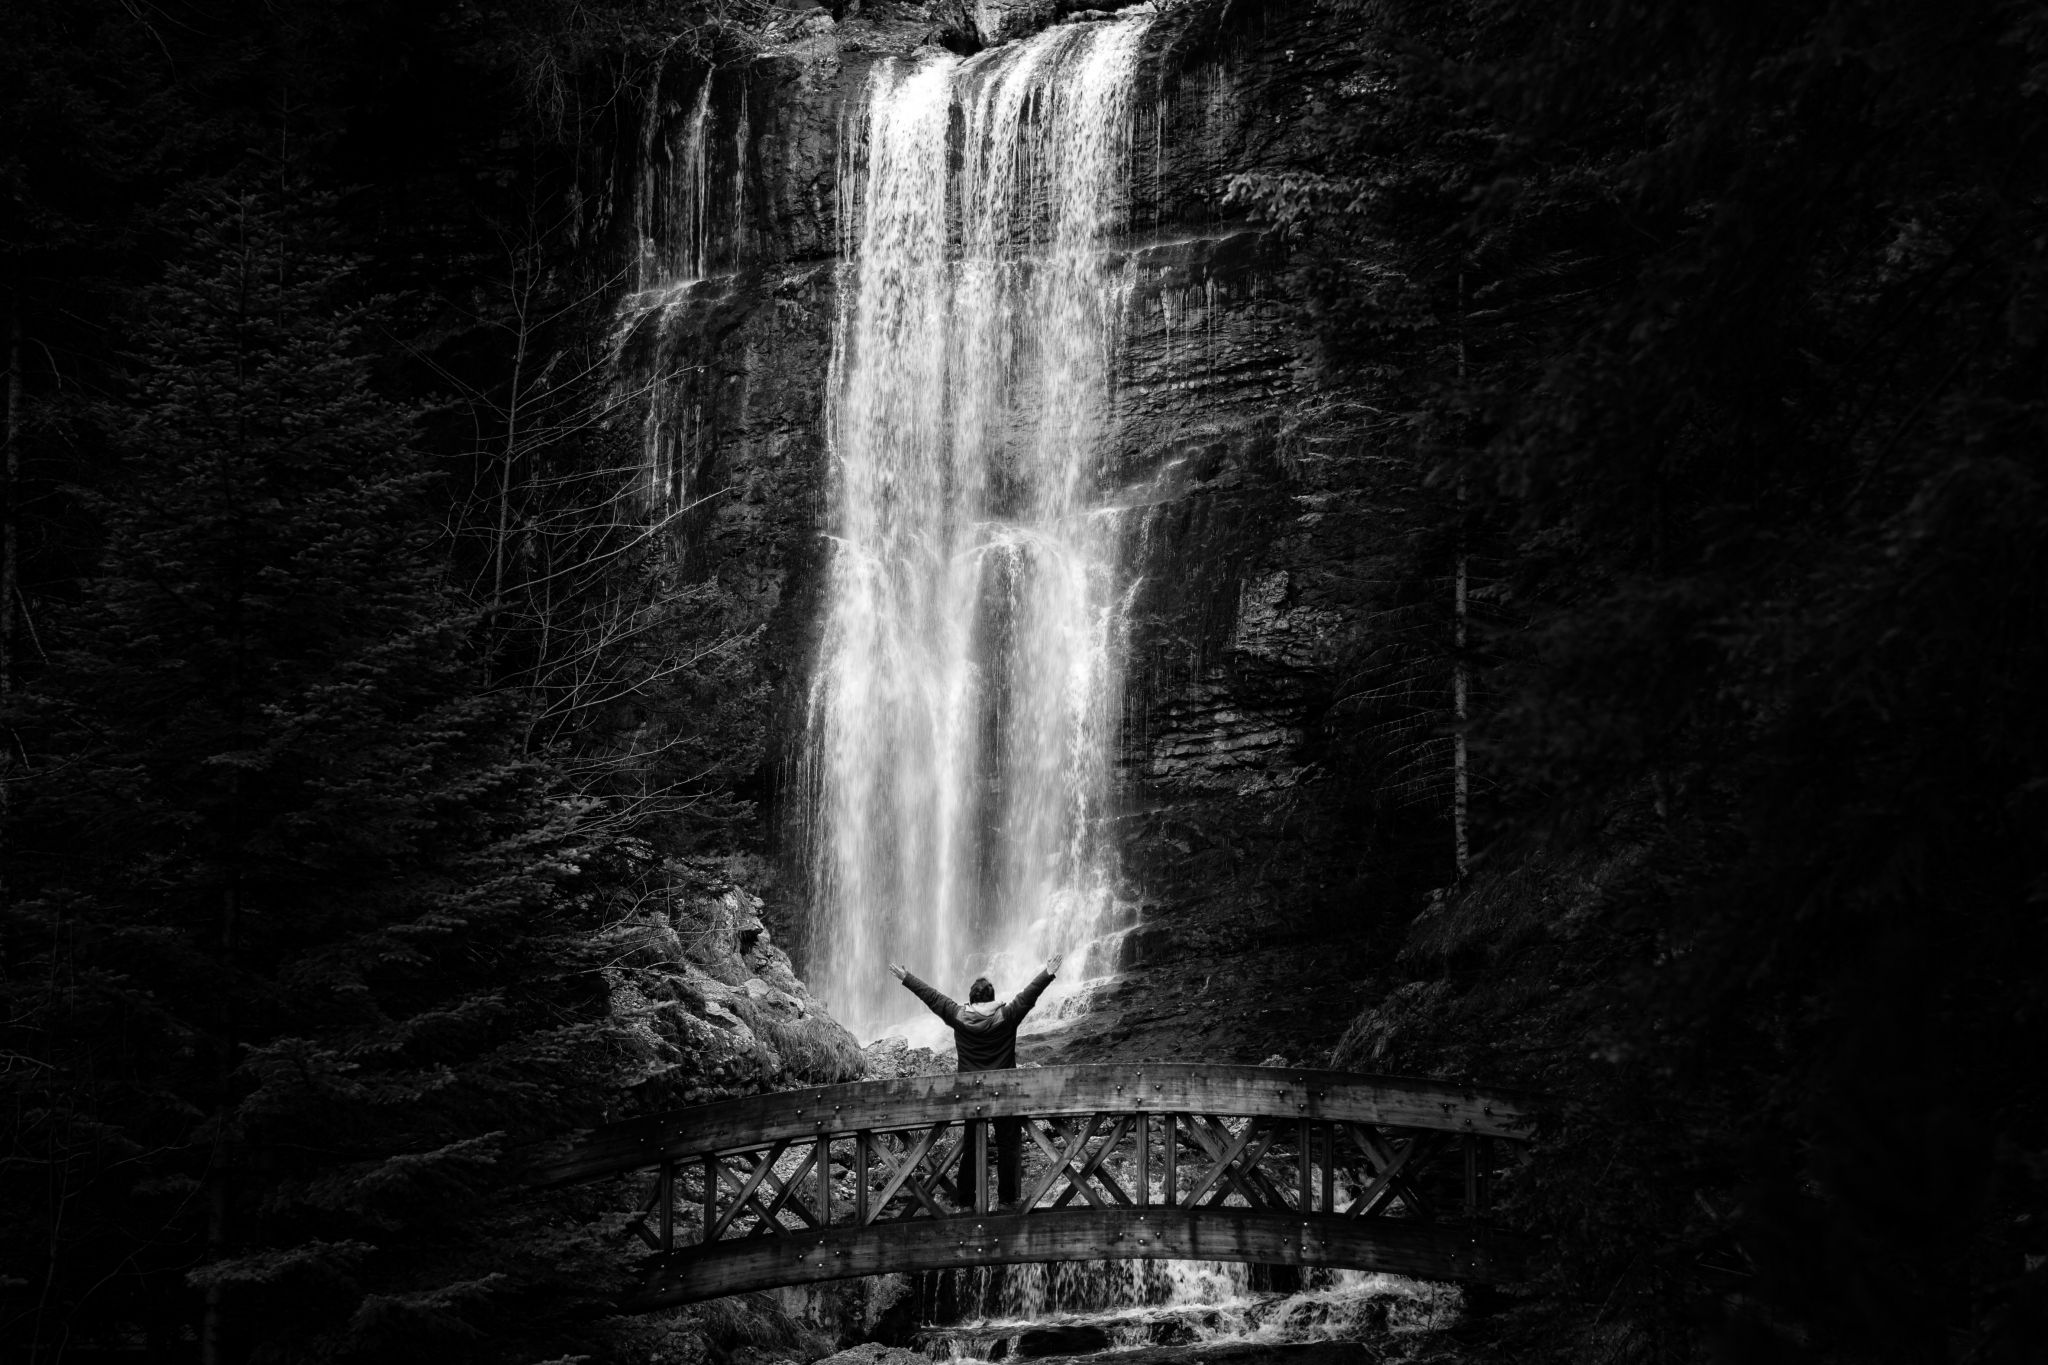 Cascade du Cirque de Saint-Meme, France